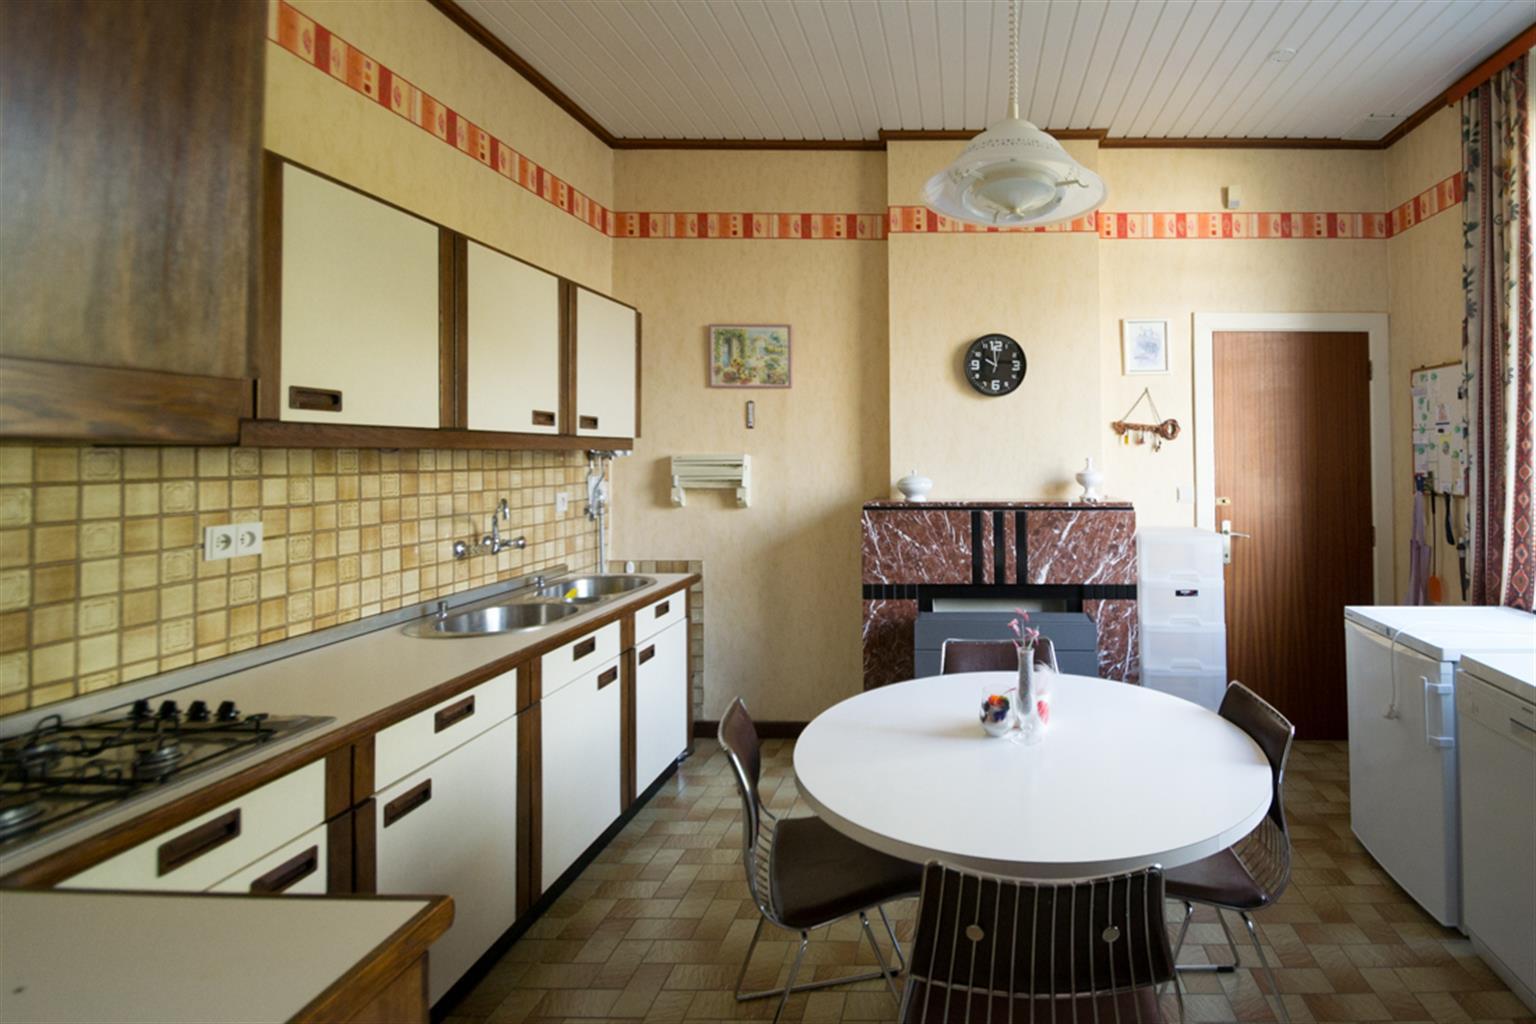 Maison - Leval-Trahegnies - #4345091-6